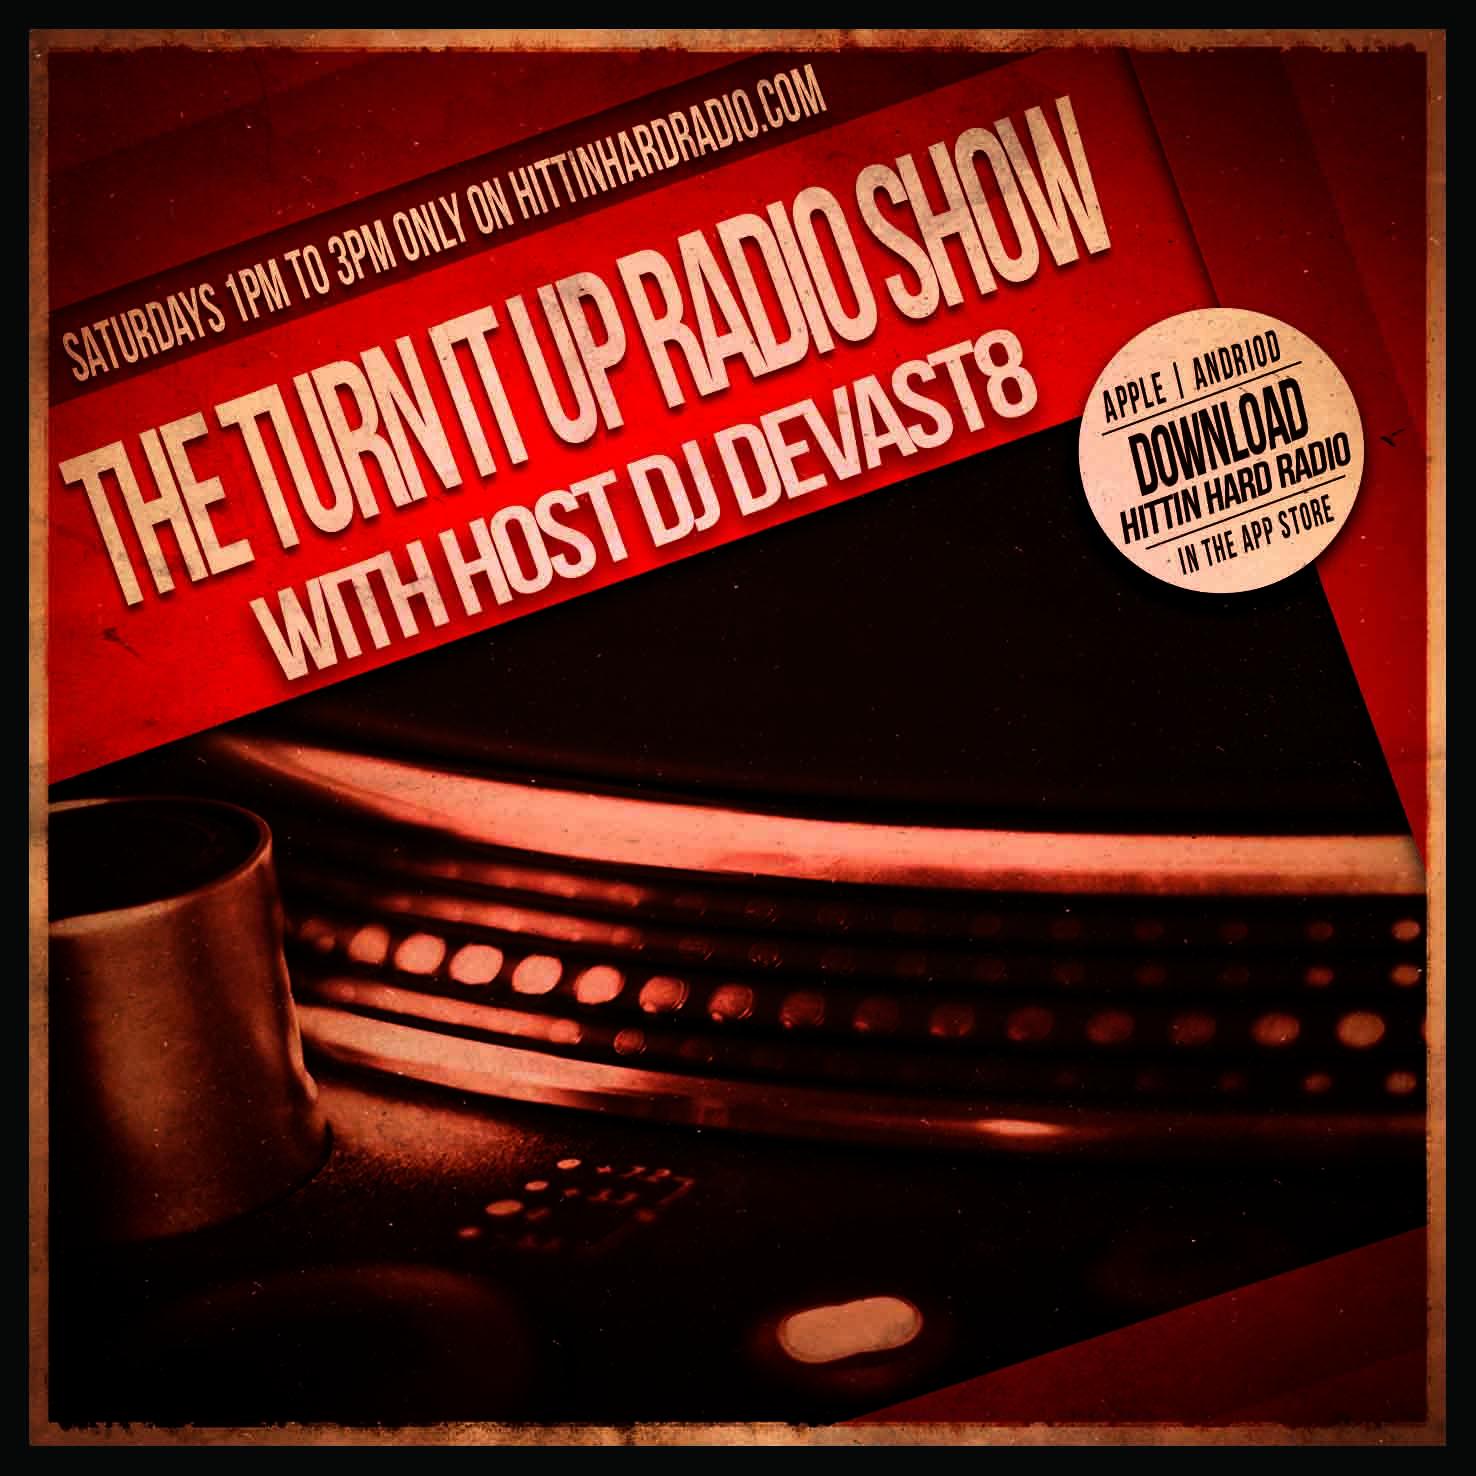 Turn it up radio podcast